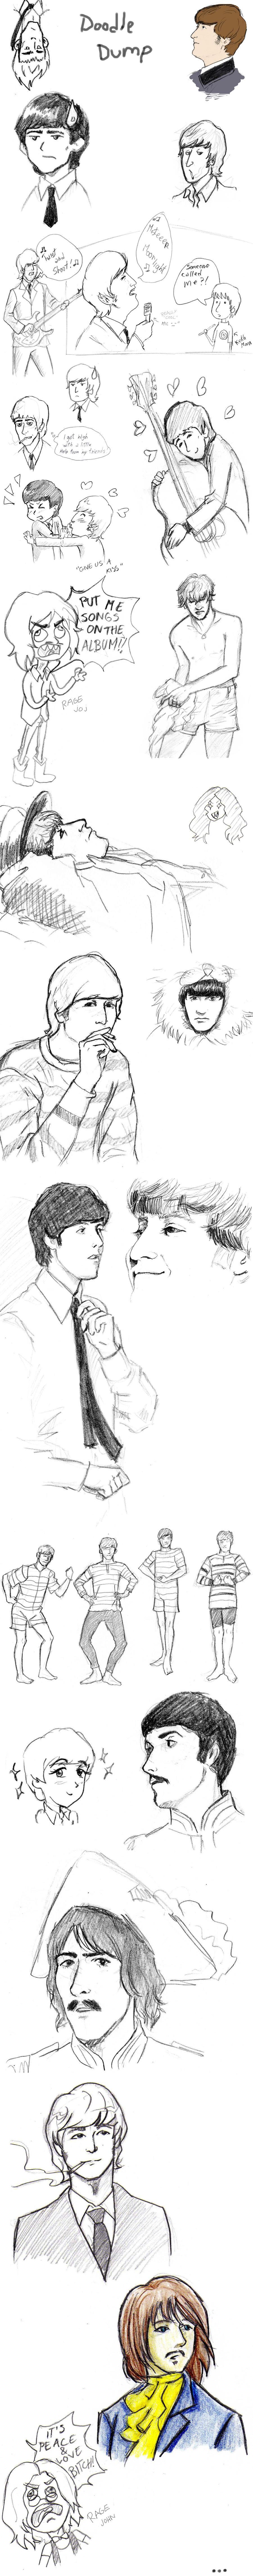 HUGE Beatles doodle dump by ayumi58